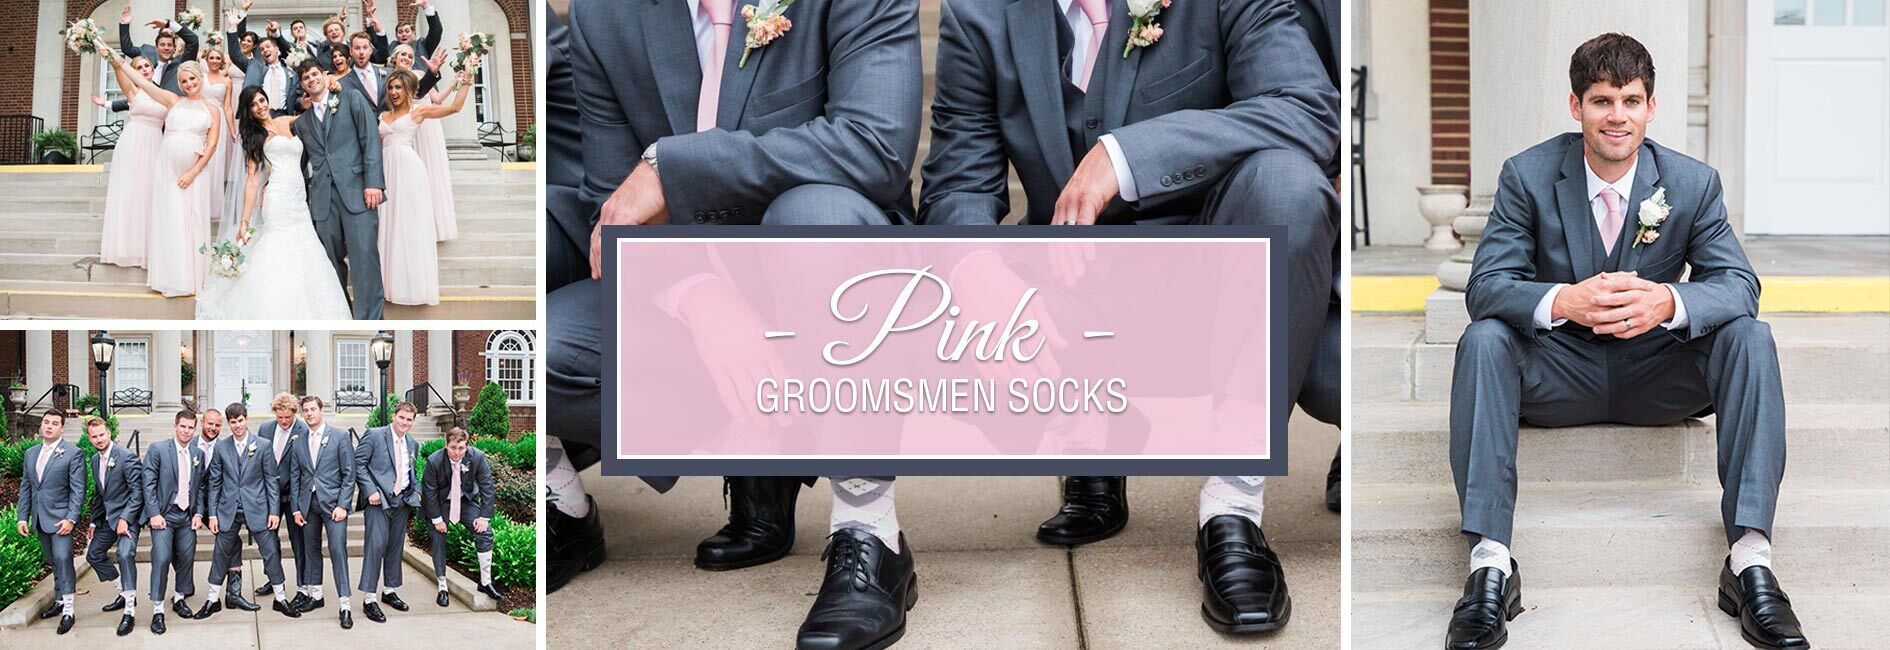 Pink Groomsmen Wedding Socks Banner